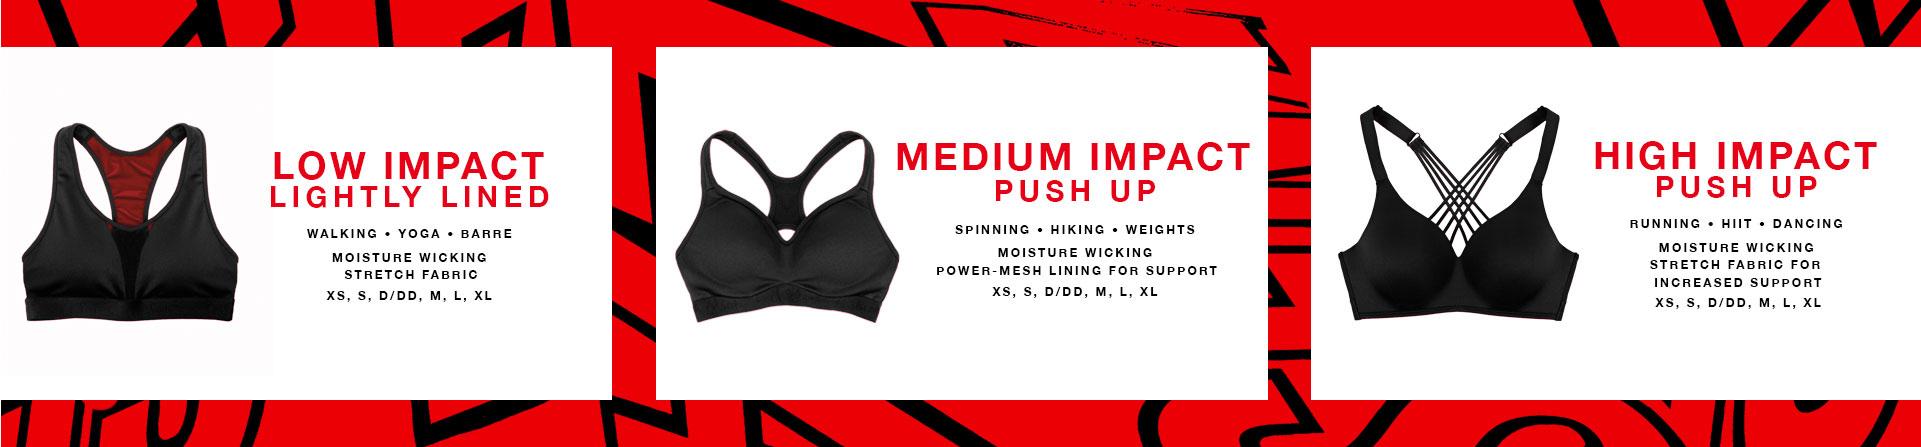 Low Impact - Lightly lined. Walking, Yoga, Barre. Moisture wicking stretch fabric. XS, S, D/DD, M, L, XL. Medium Impact - Push up. Spinning, Hiking, Weights. Moisture wicking power-mesh lining for support. XS, S, D/DD, M, L, XL.